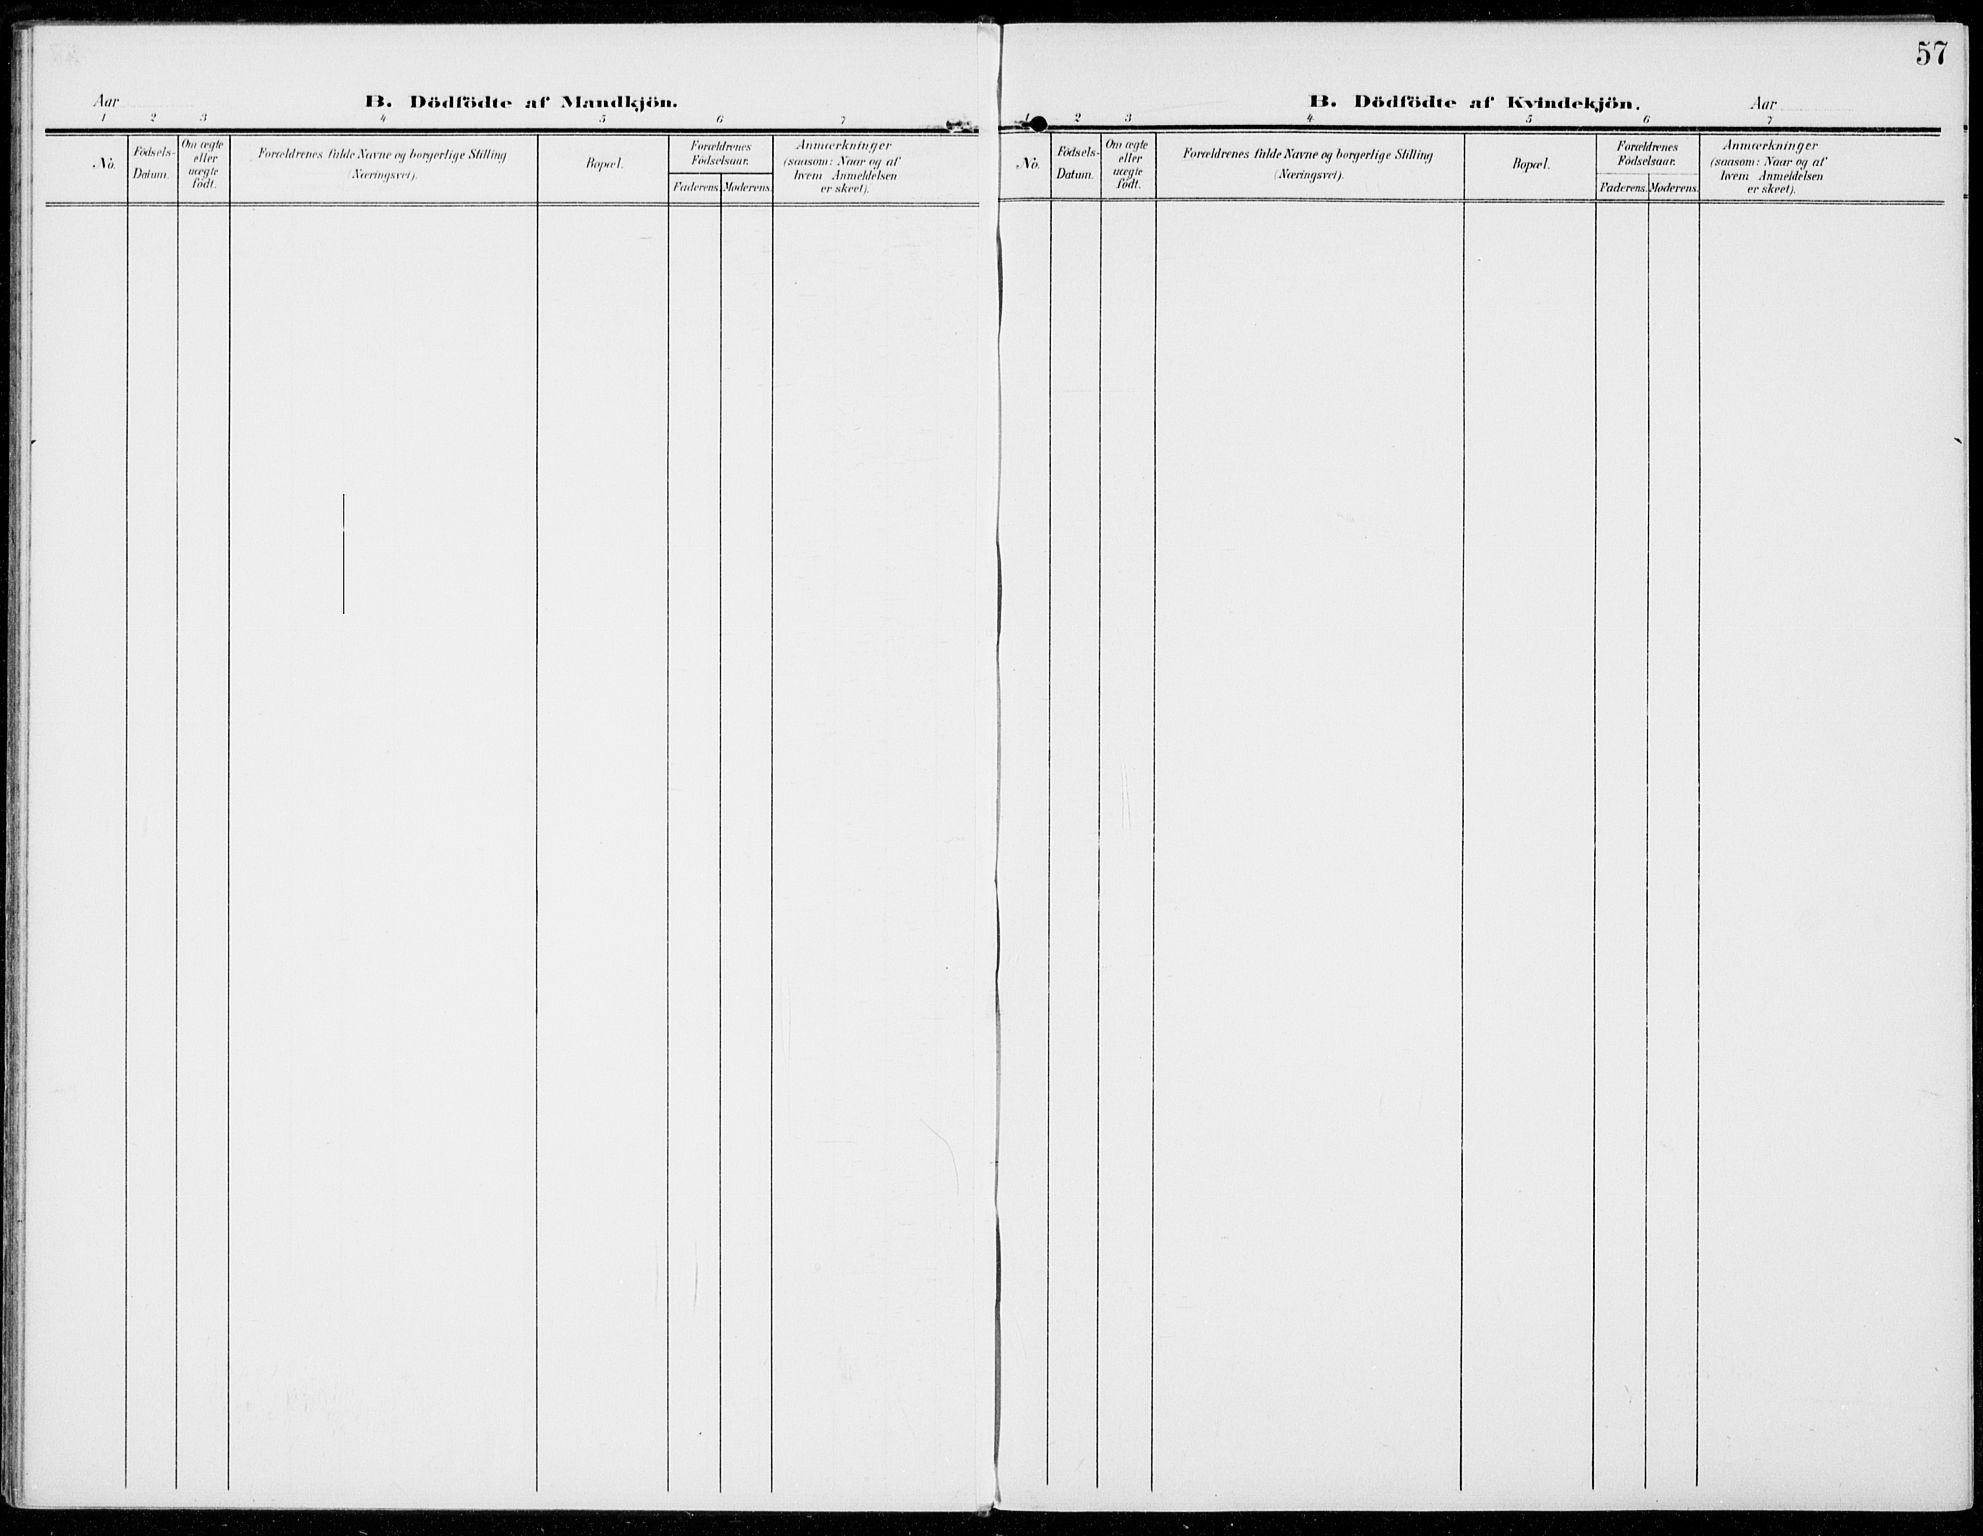 SAH, Sel prestekontor, Ministerialbok nr. 1, 1905-1922, s. 57